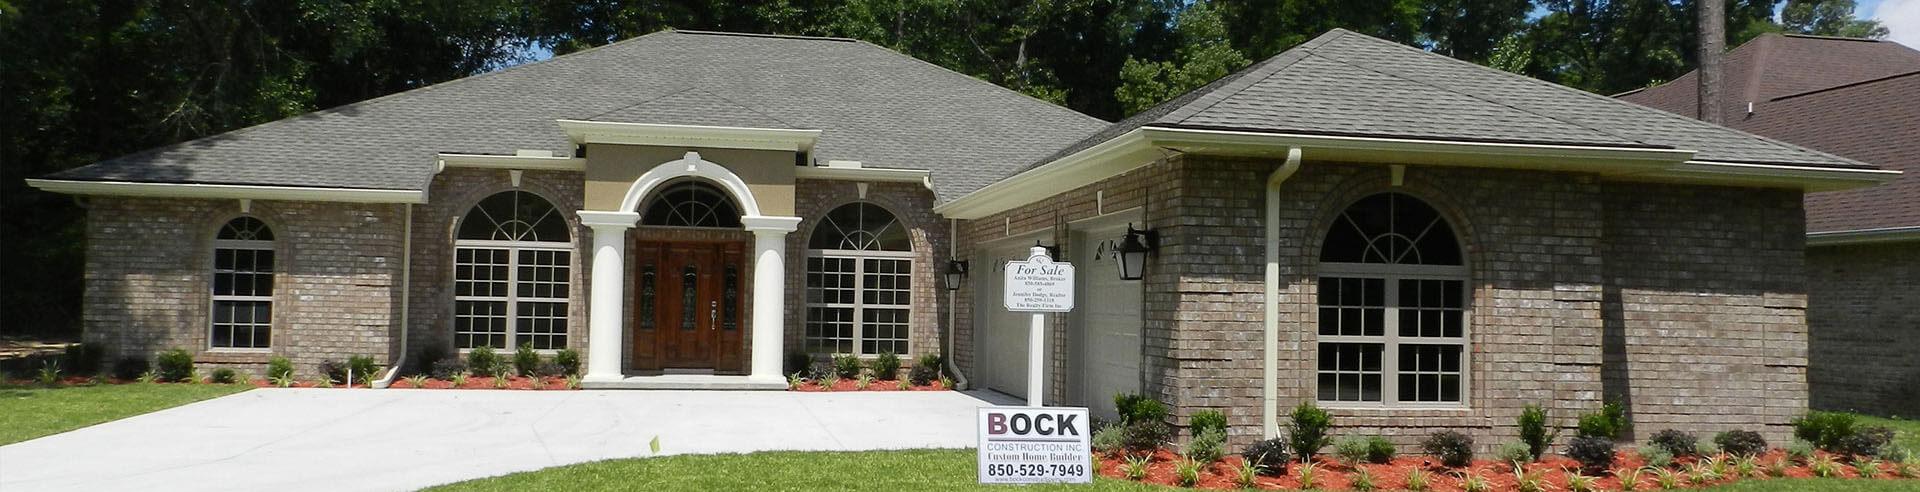 Destin Bock Construction Inc